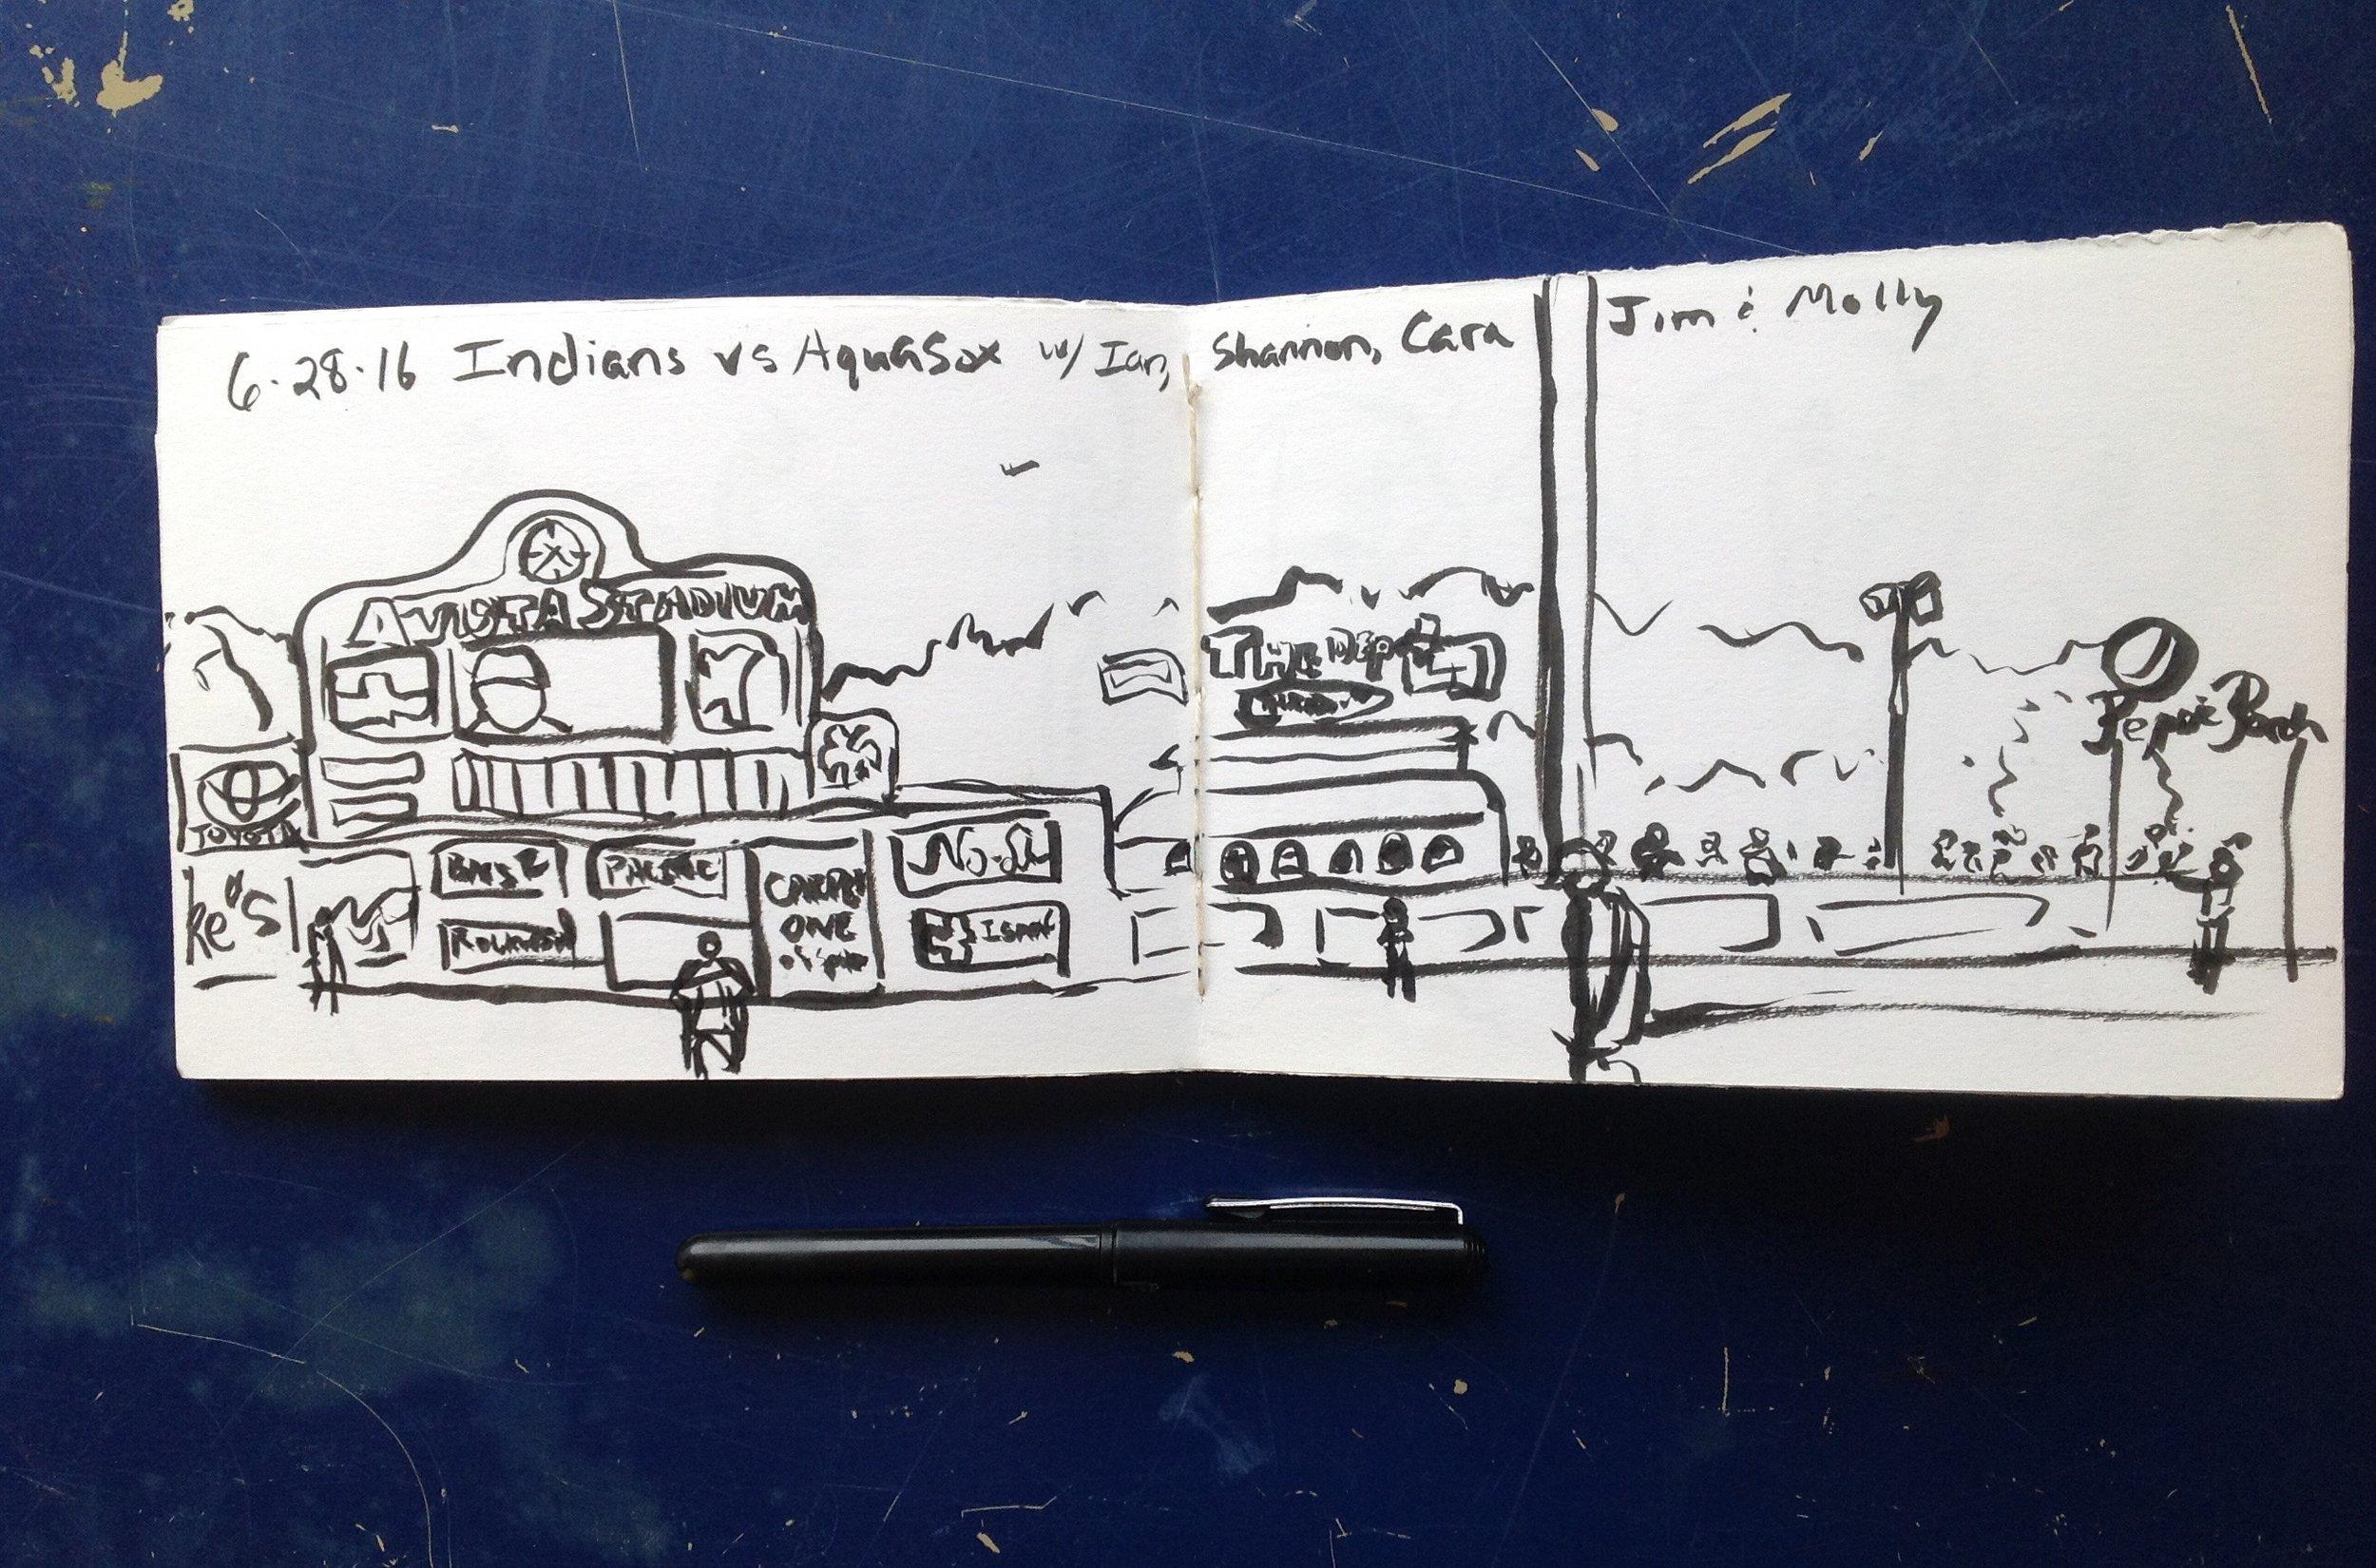 avistastadium sketchbookpage